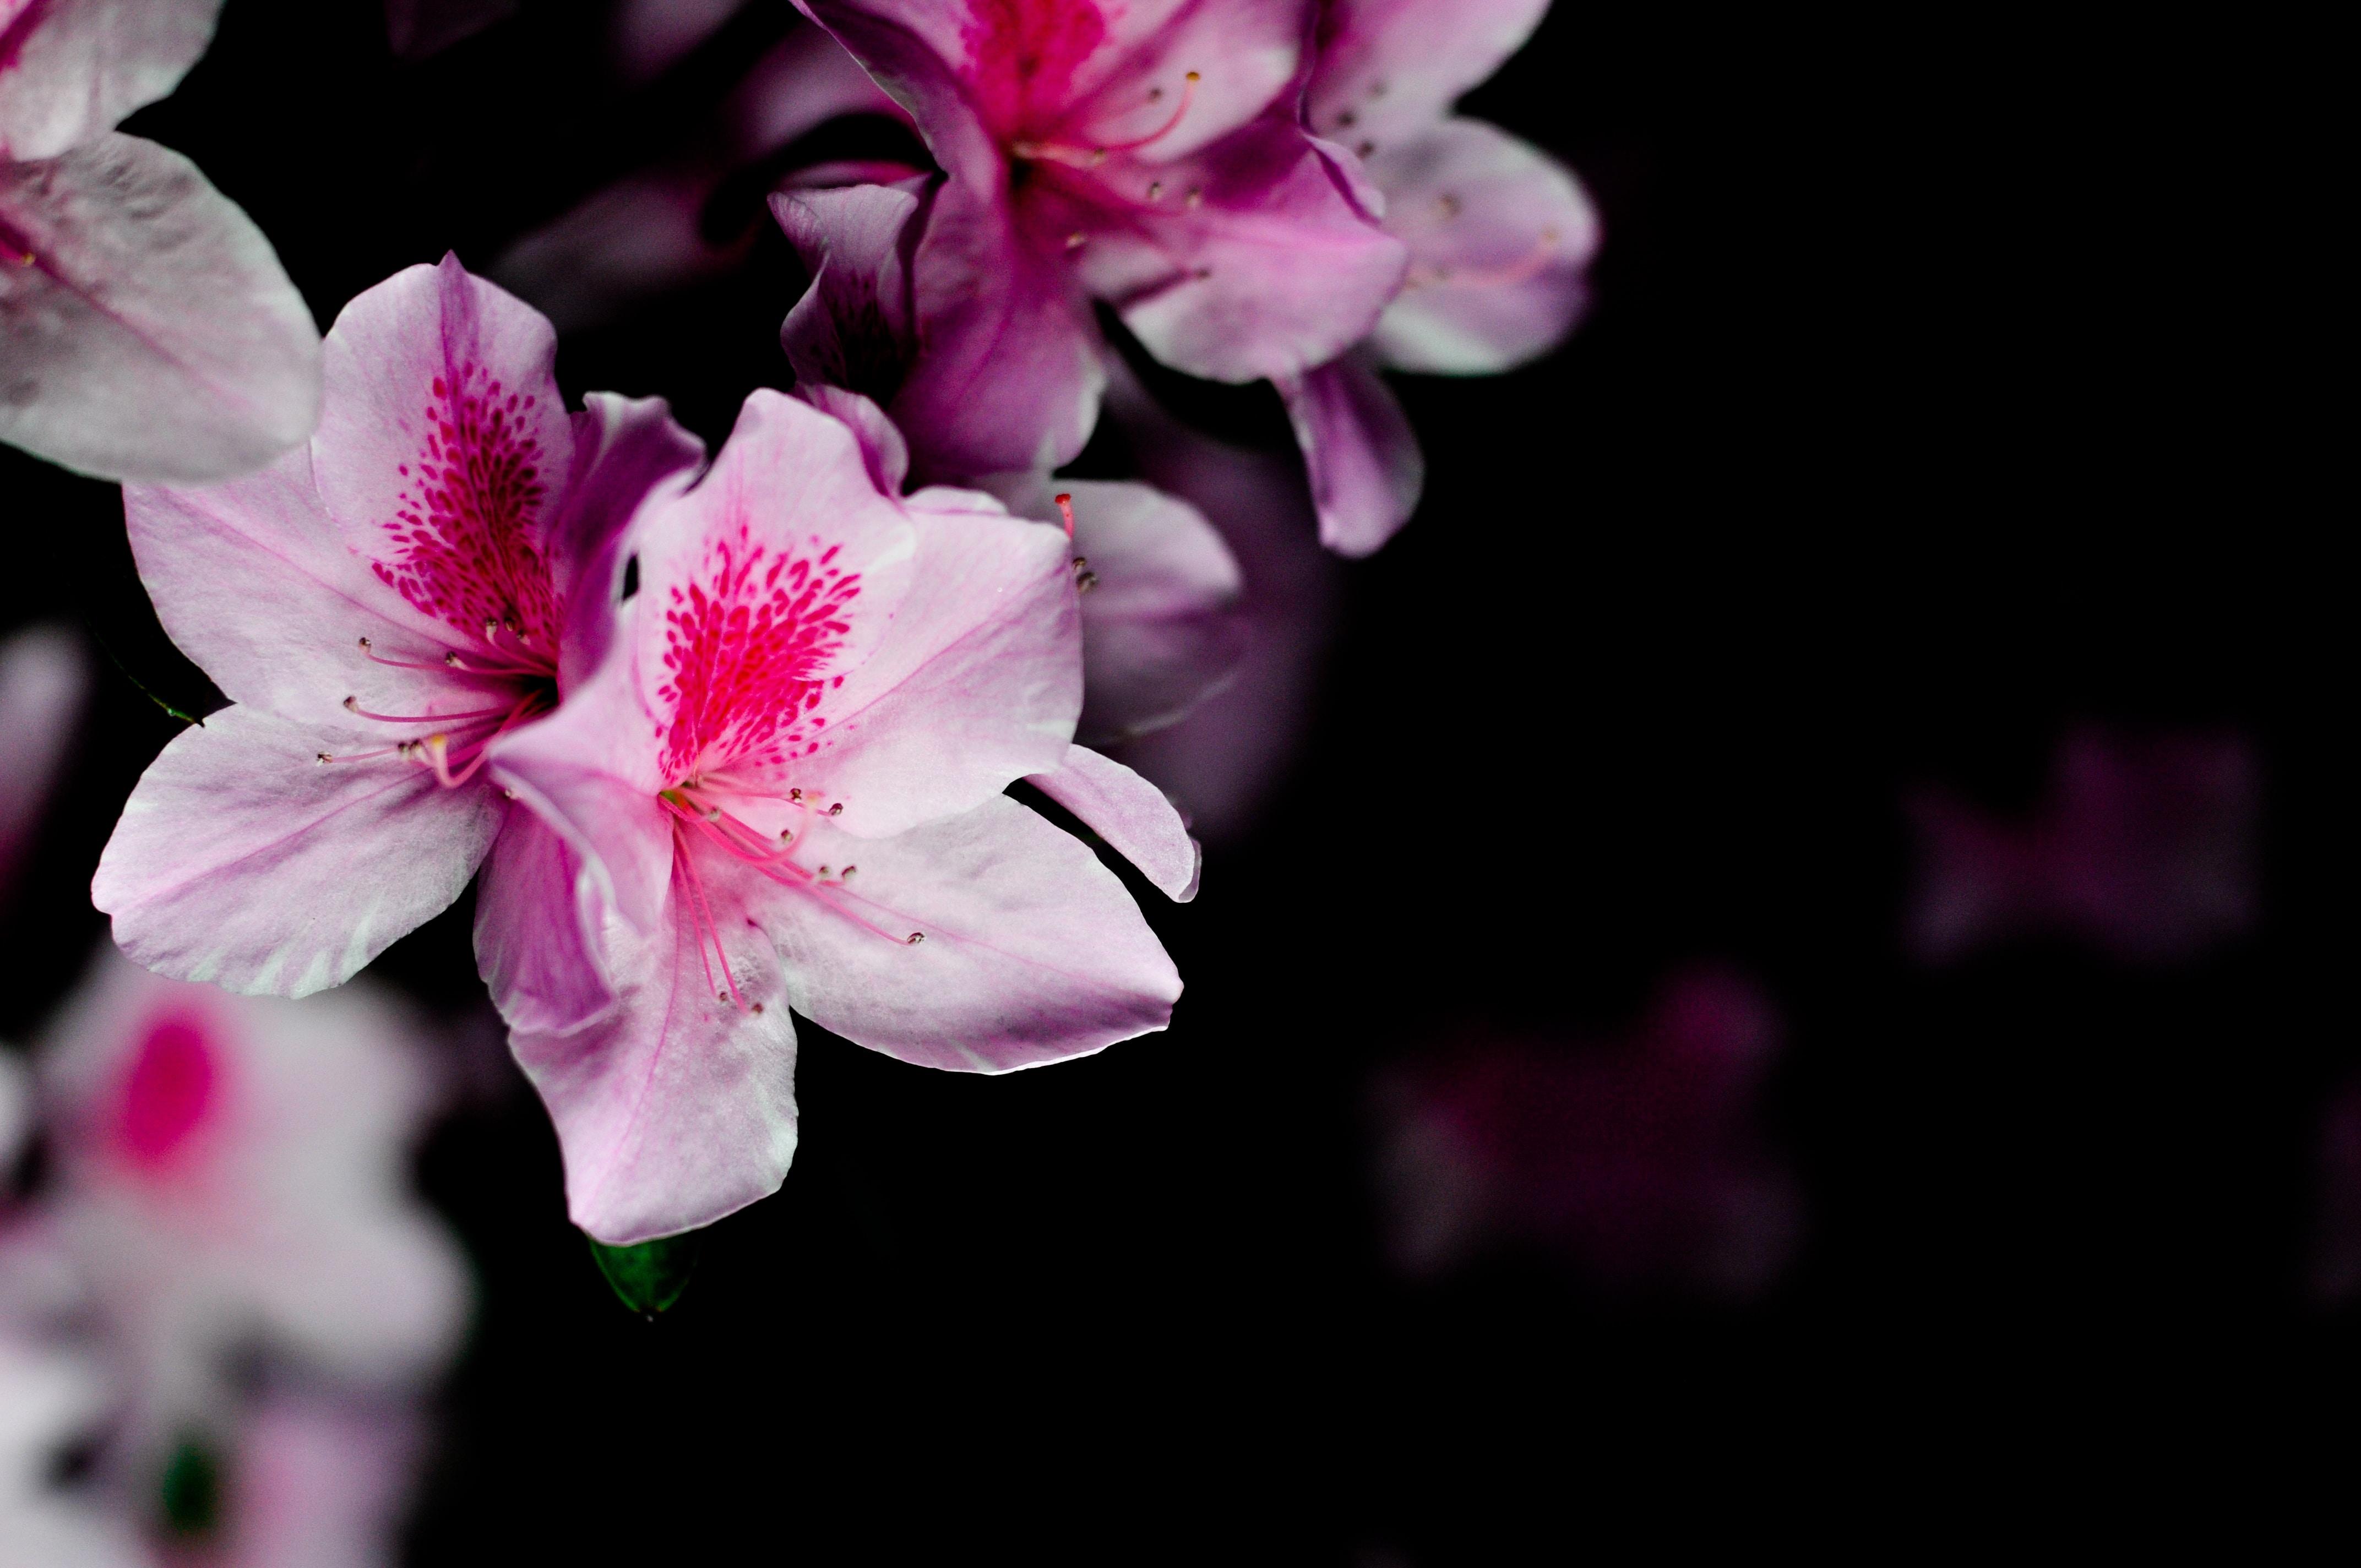 tilt shift photography of pink flower